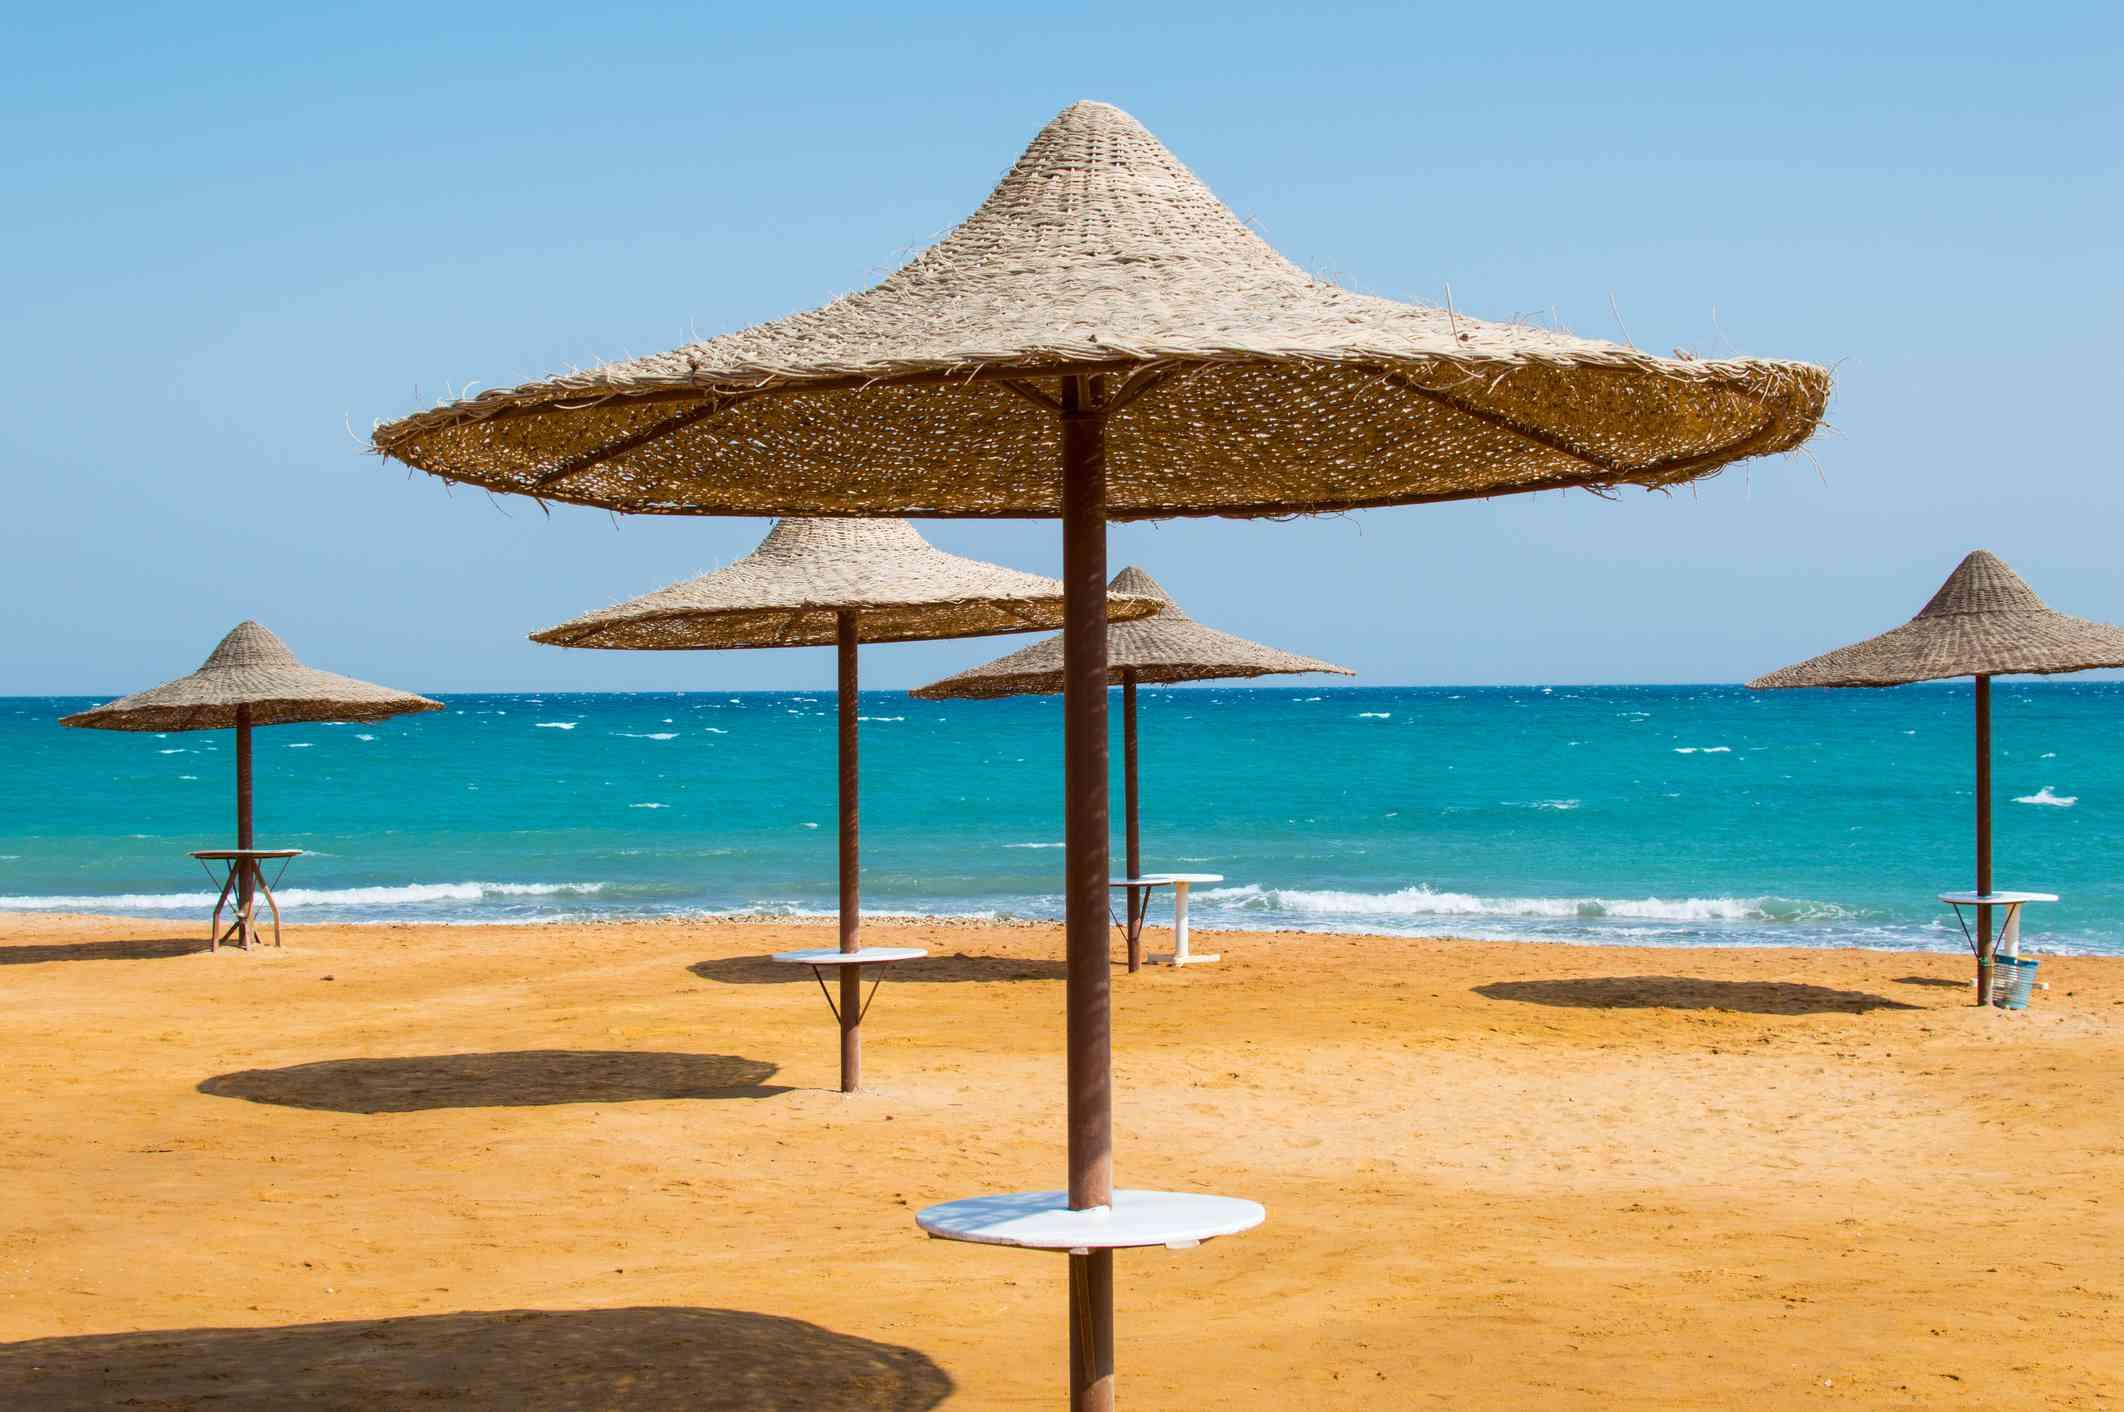 Umbrellas on the beach at Ain Sokhna, Egypt